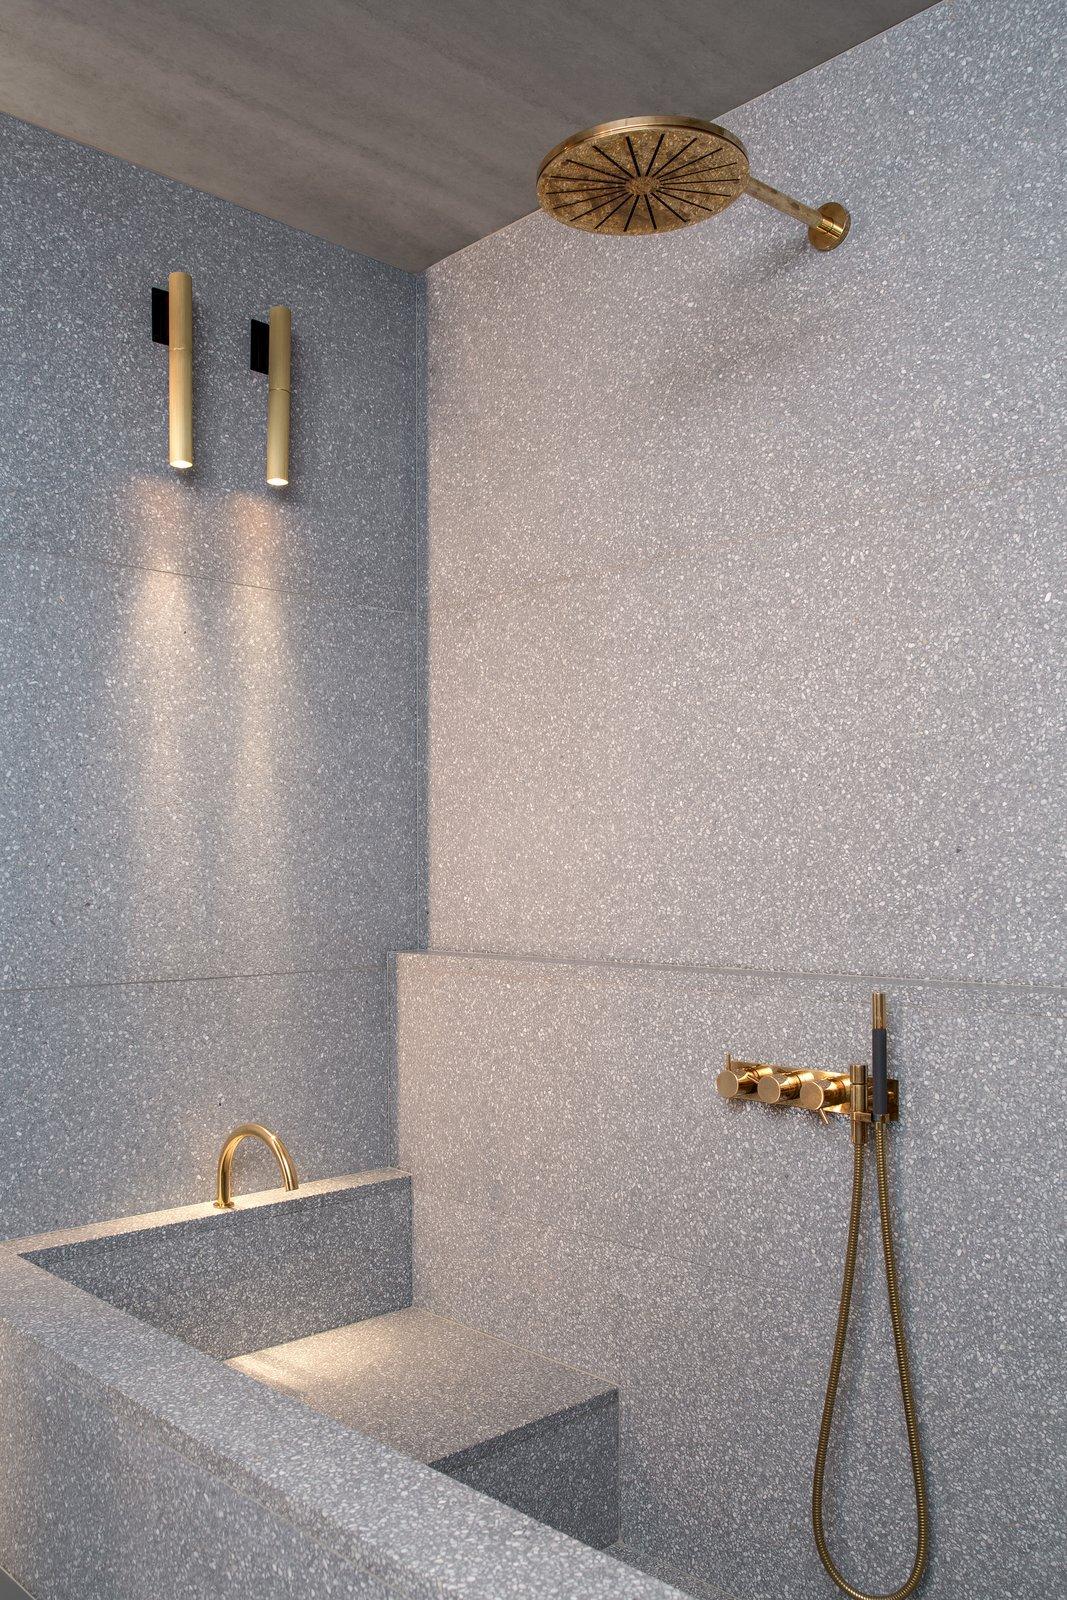 Ester's Apartment 2.0 by Ester Bruzkus Bathroom